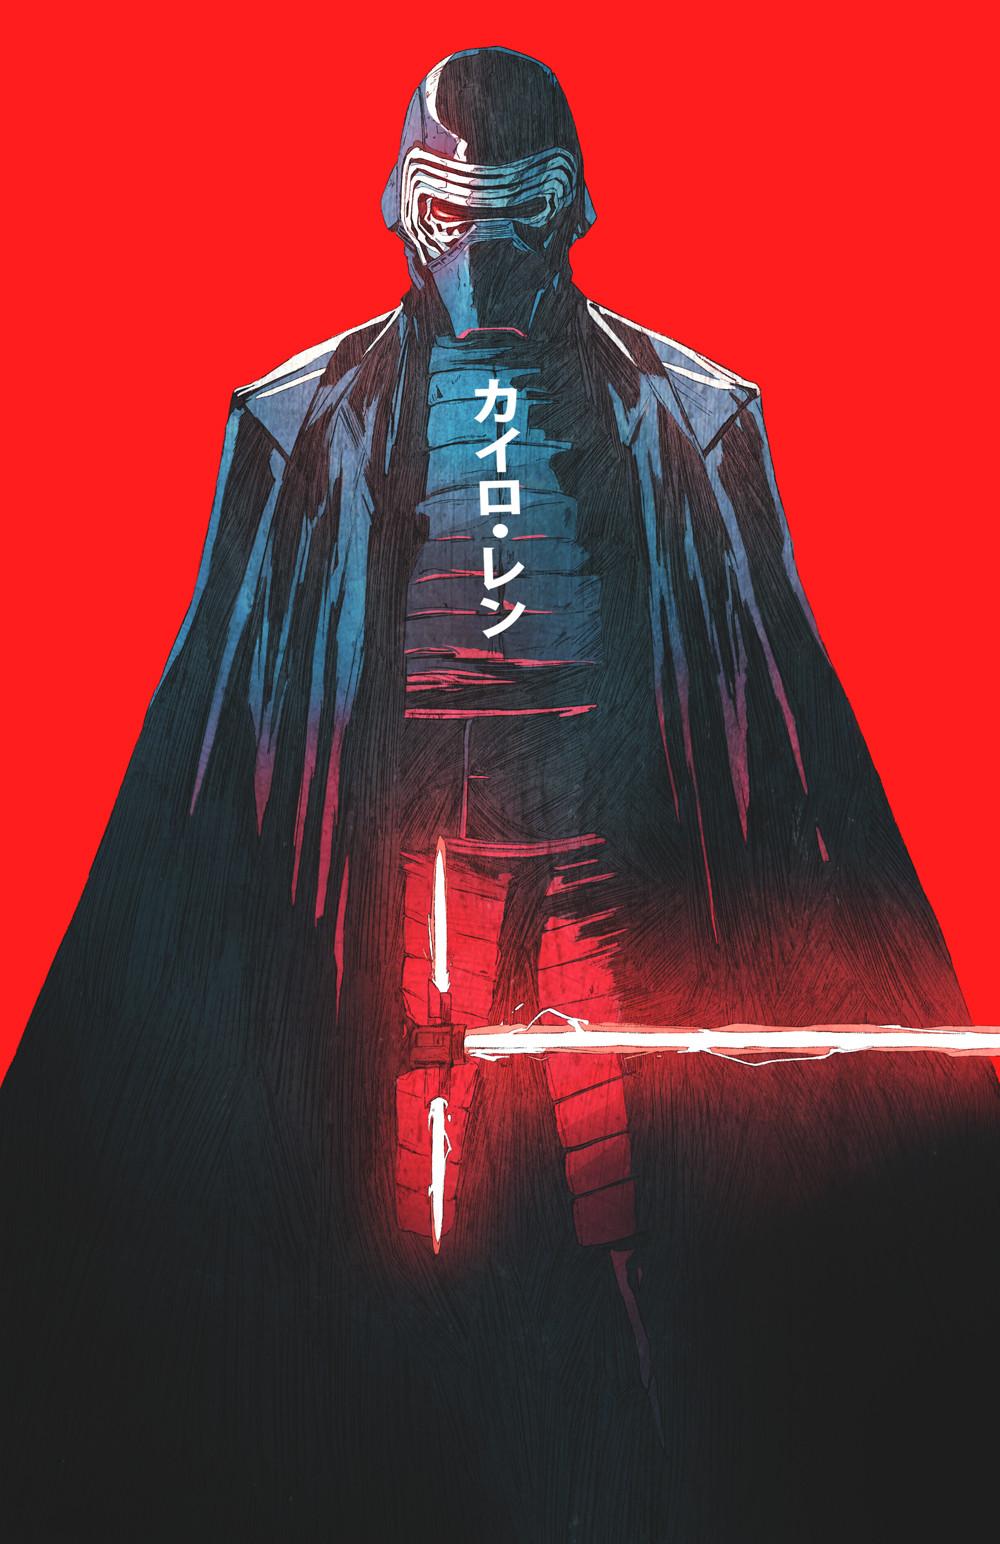 General 1000x1544 Chun Lo drawing Star Wars lightsaber Kylo Ren vertical